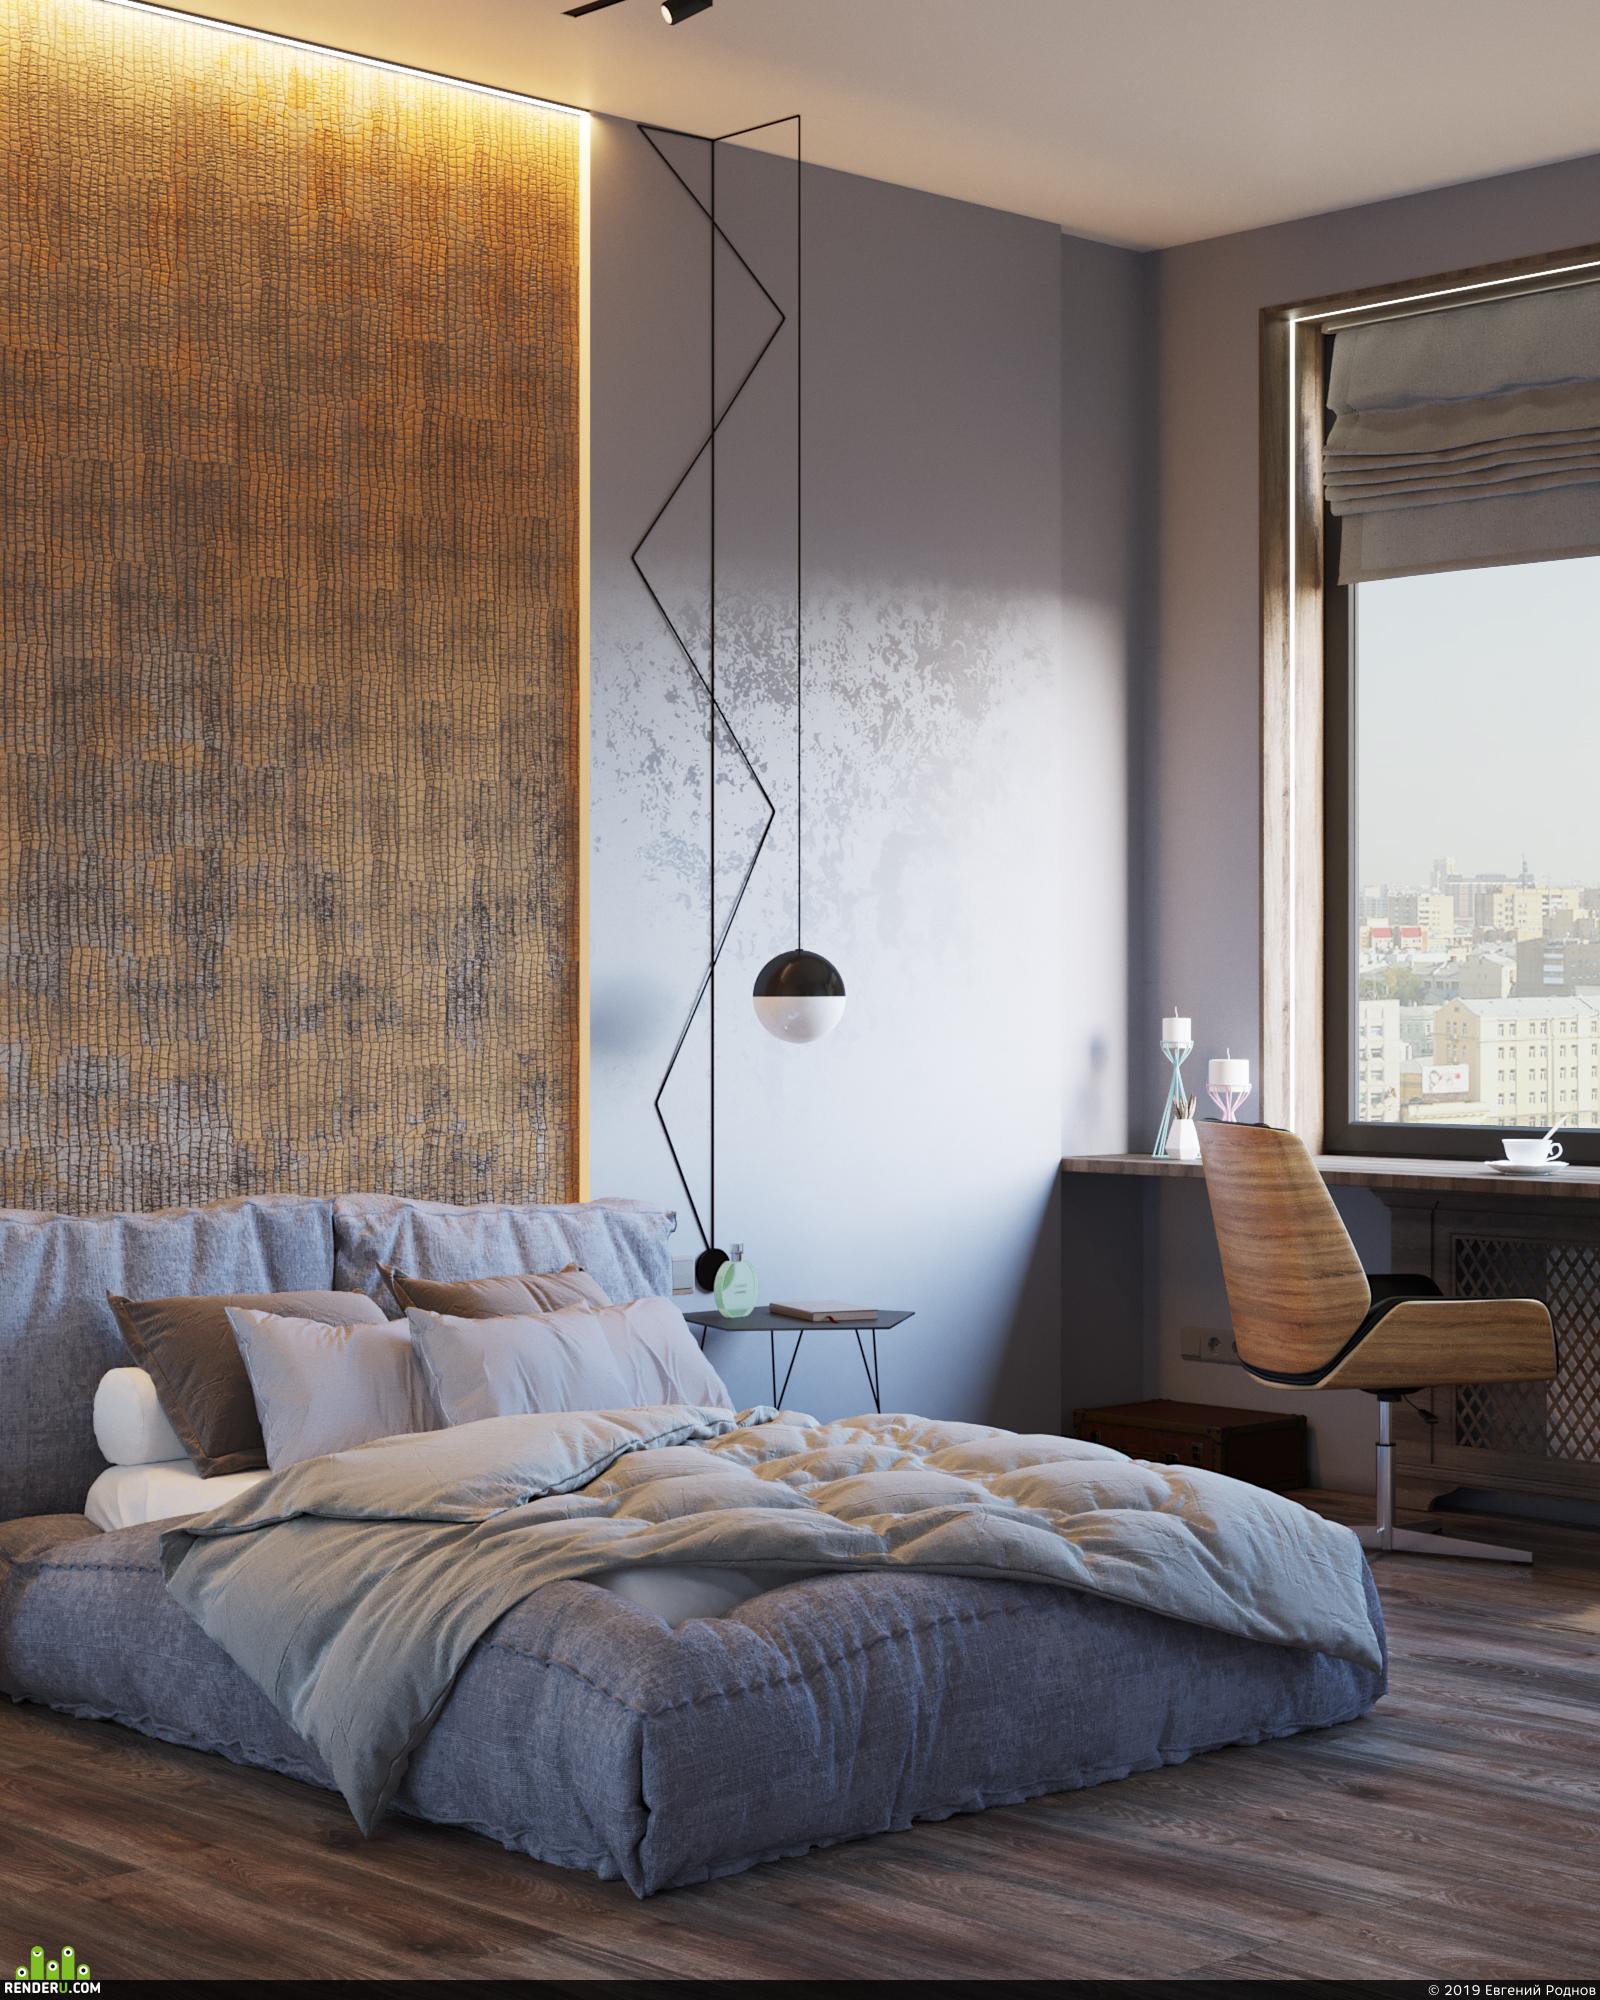 preview Визуализация квартиры в ЖК Царская площадь, г. Москва